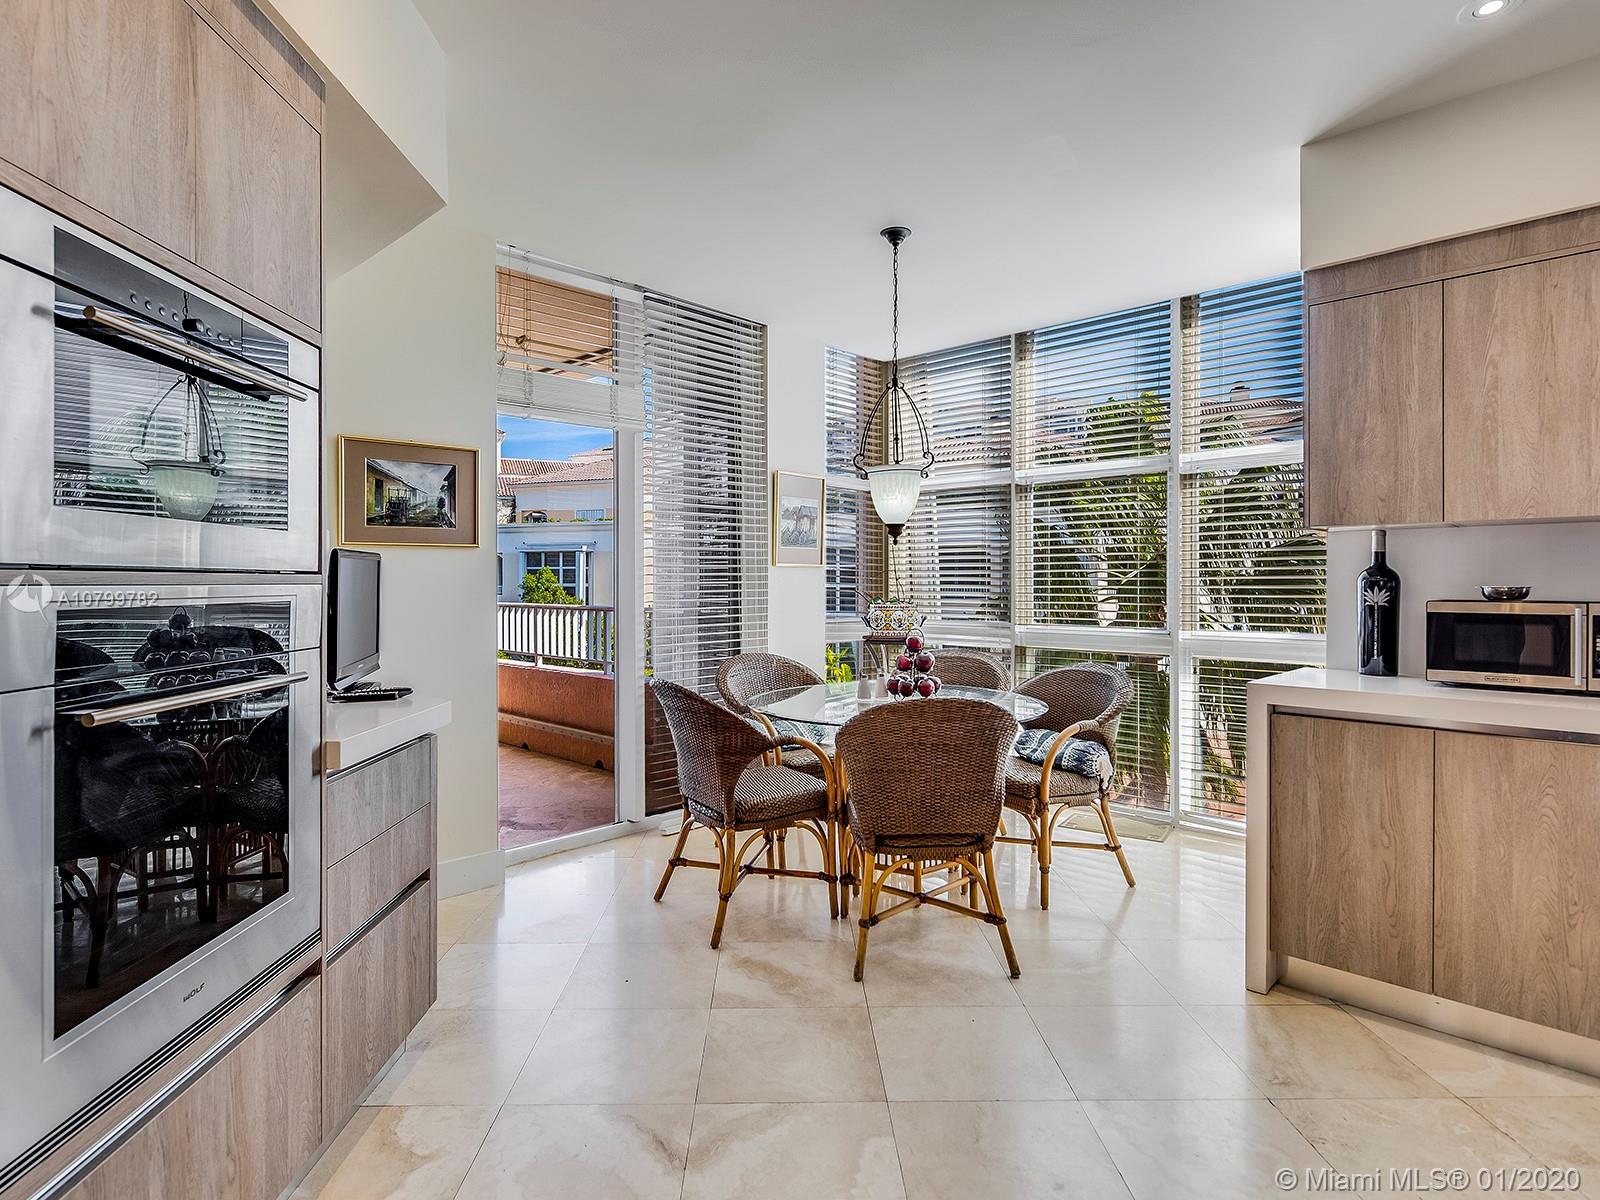 737 Crandon Blvd # 402, Key Biscayne, Florida 33149, 3 Bedrooms Bedrooms, ,3 BathroomsBathrooms,Residential,For Sale,737 Crandon Blvd # 402,A10799782